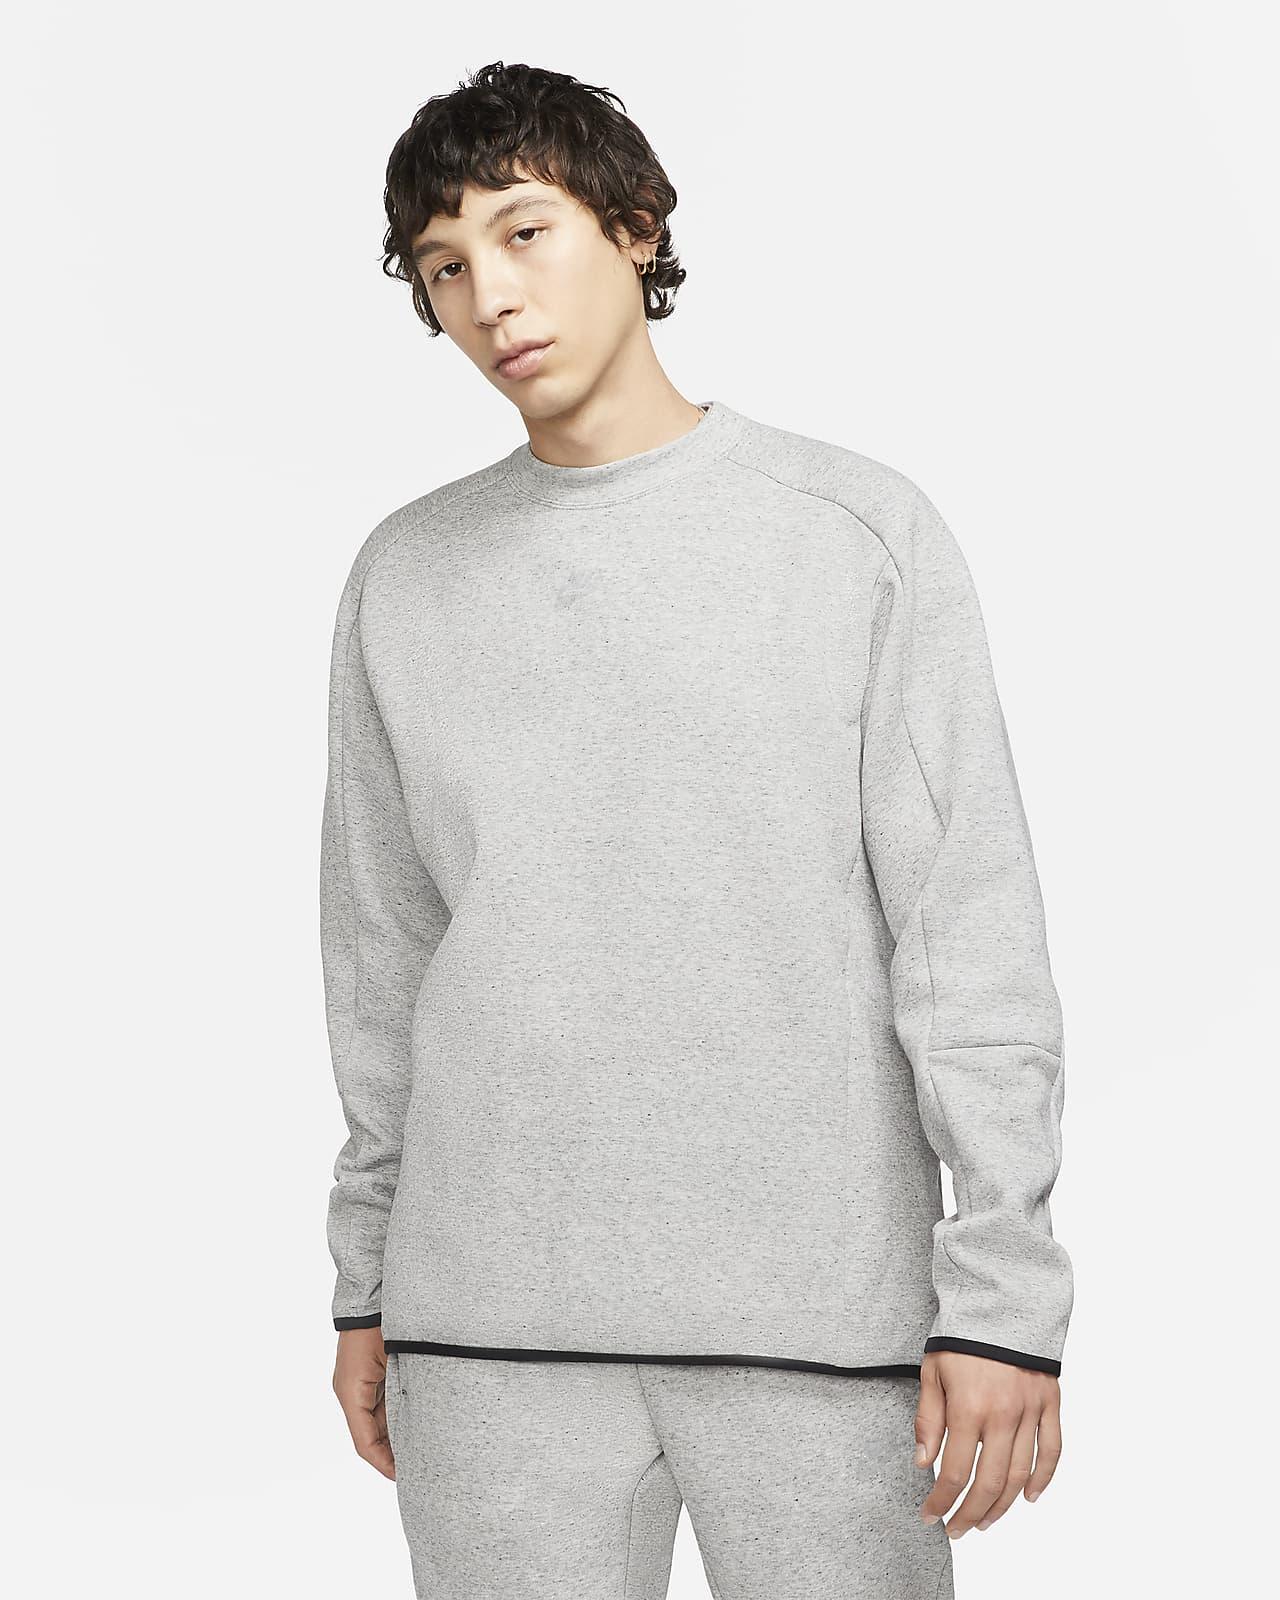 Nike Sportswear Tech Fleece Erkek Crew Üstü